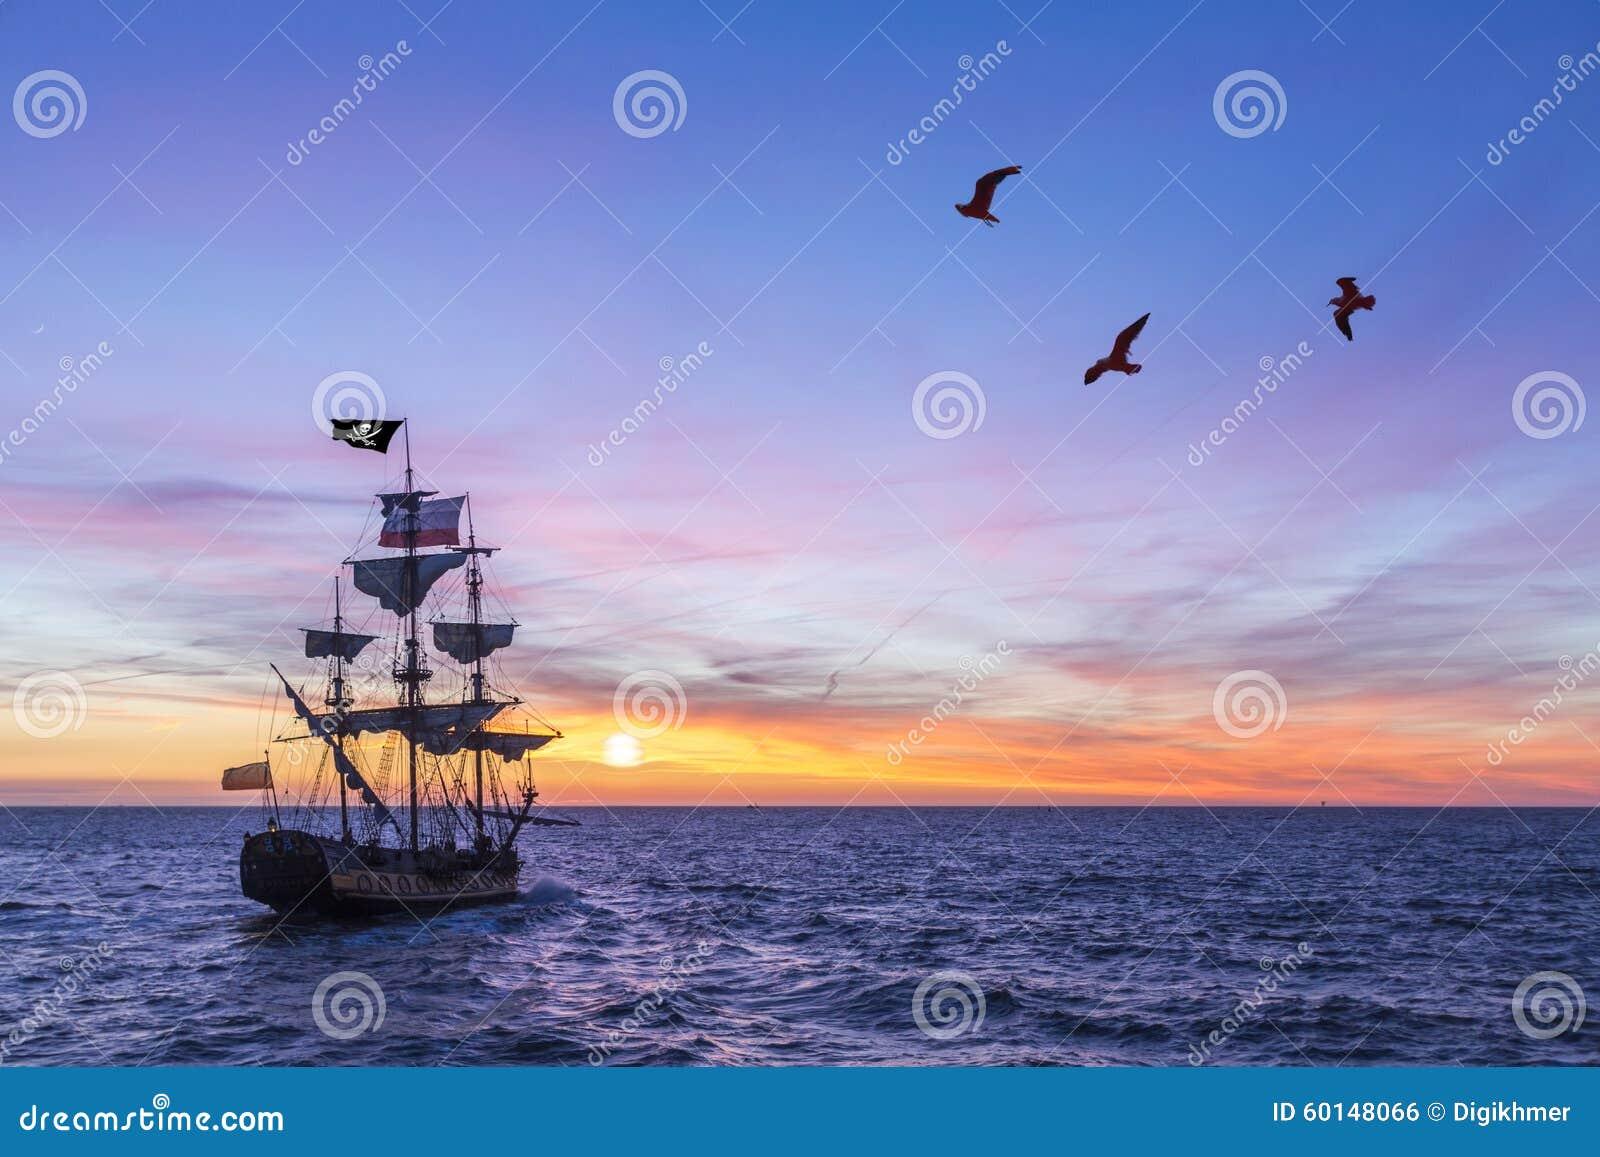 Antique Pirate Ship